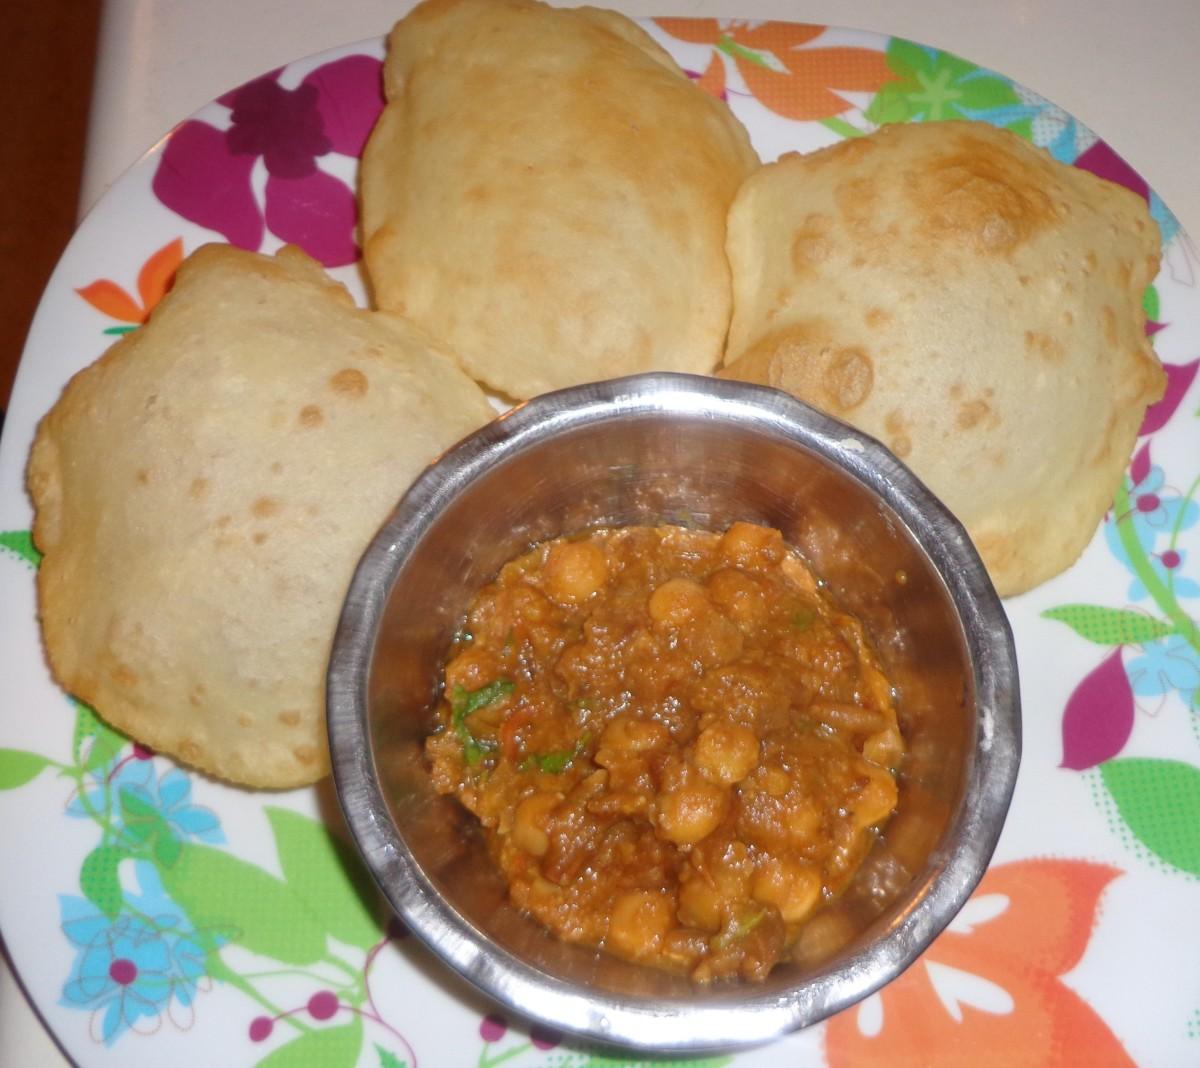 Bhatura with channa masala